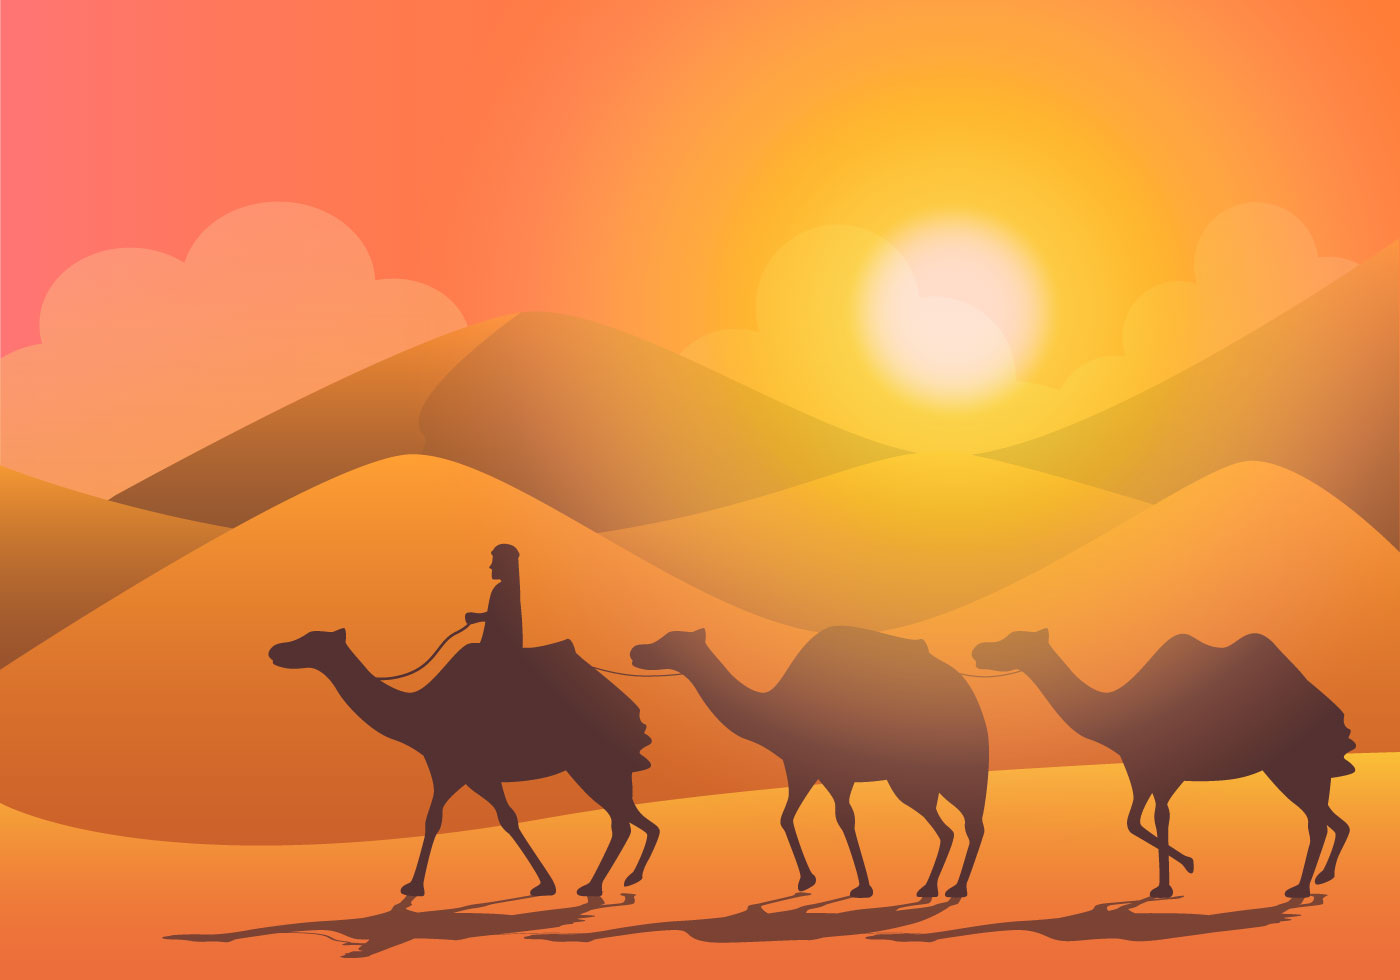 Nomad Illustration